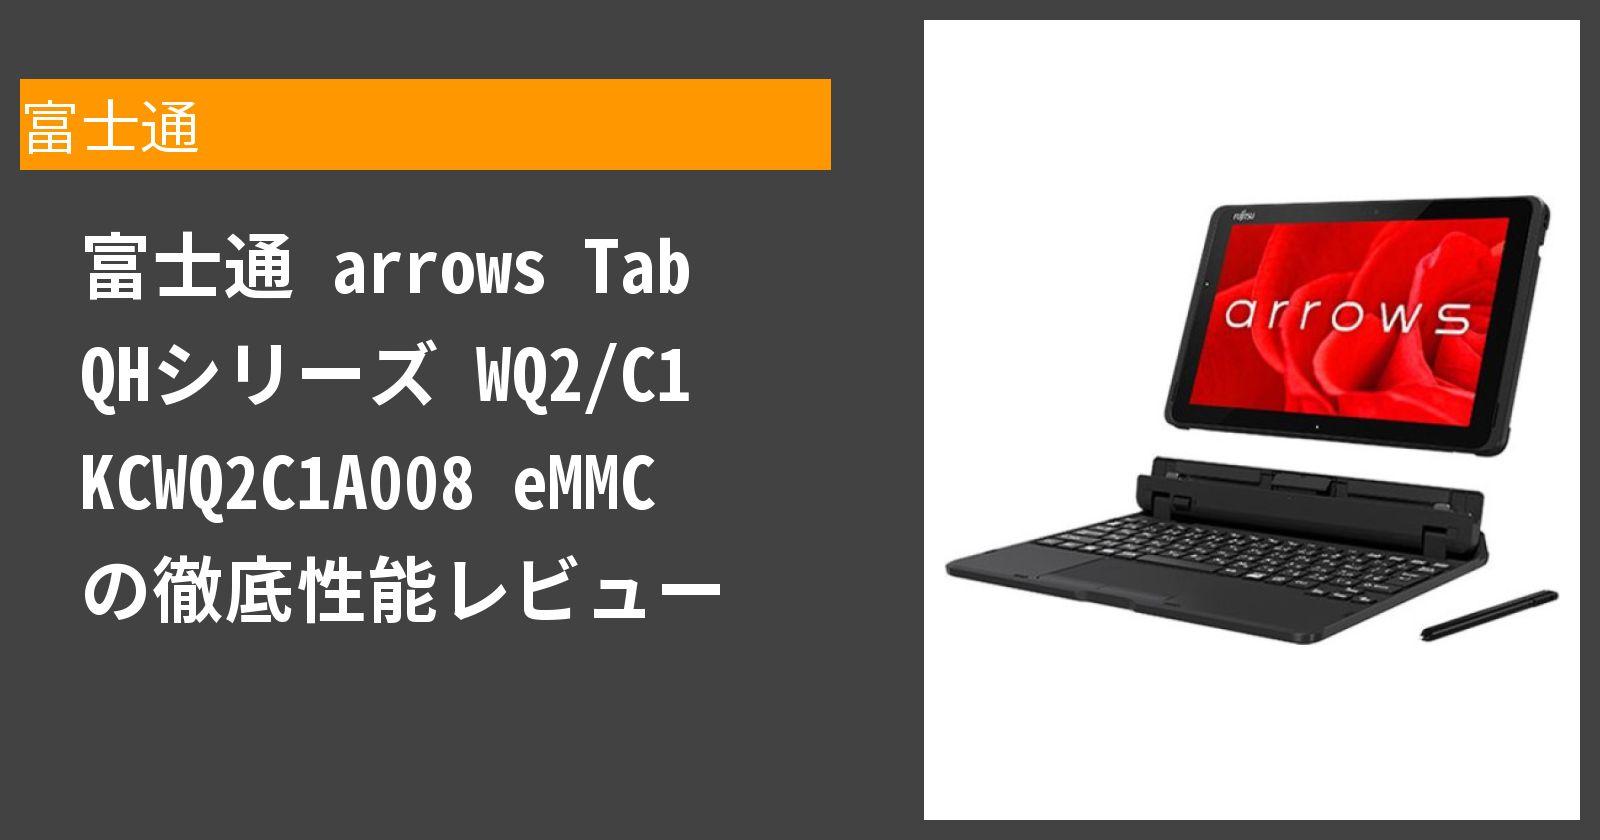 arrows Tab QHシリーズ WQ2/C1 KCWQ2C1A008 eMMC の徹底性能レビュー